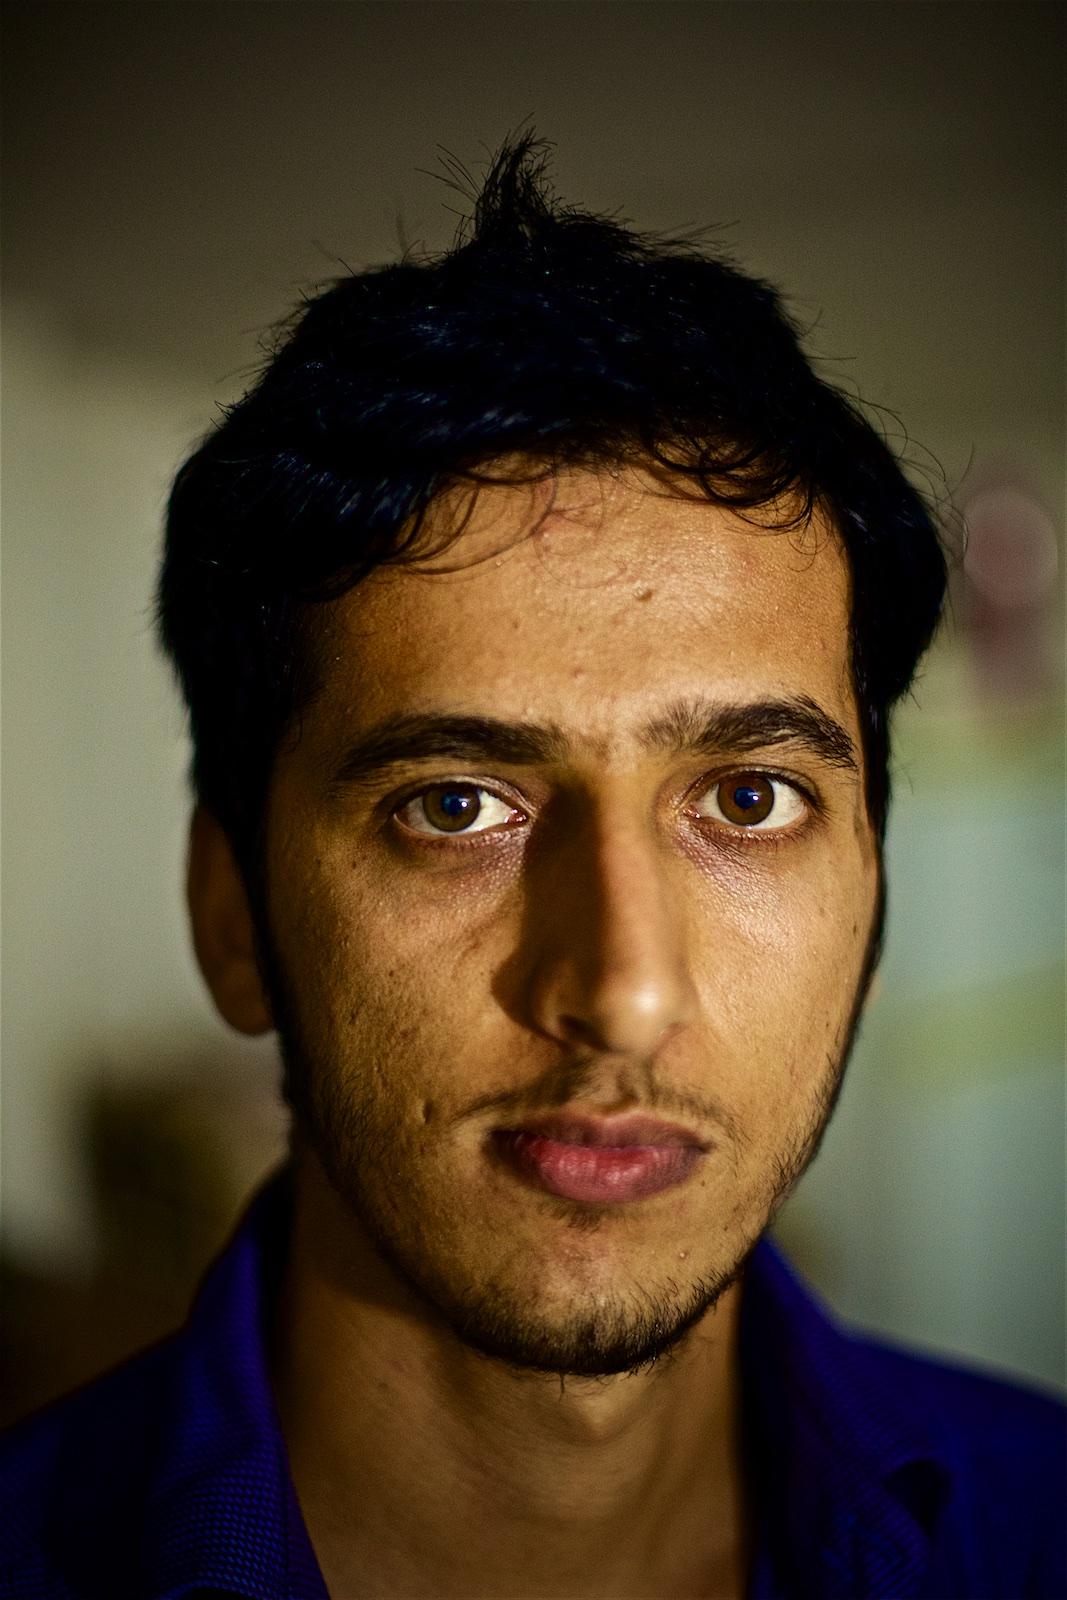 permanently-temporary-refugees-italy-rifugiati-italia-denis-bosnic-photography-portraits-5.jpg